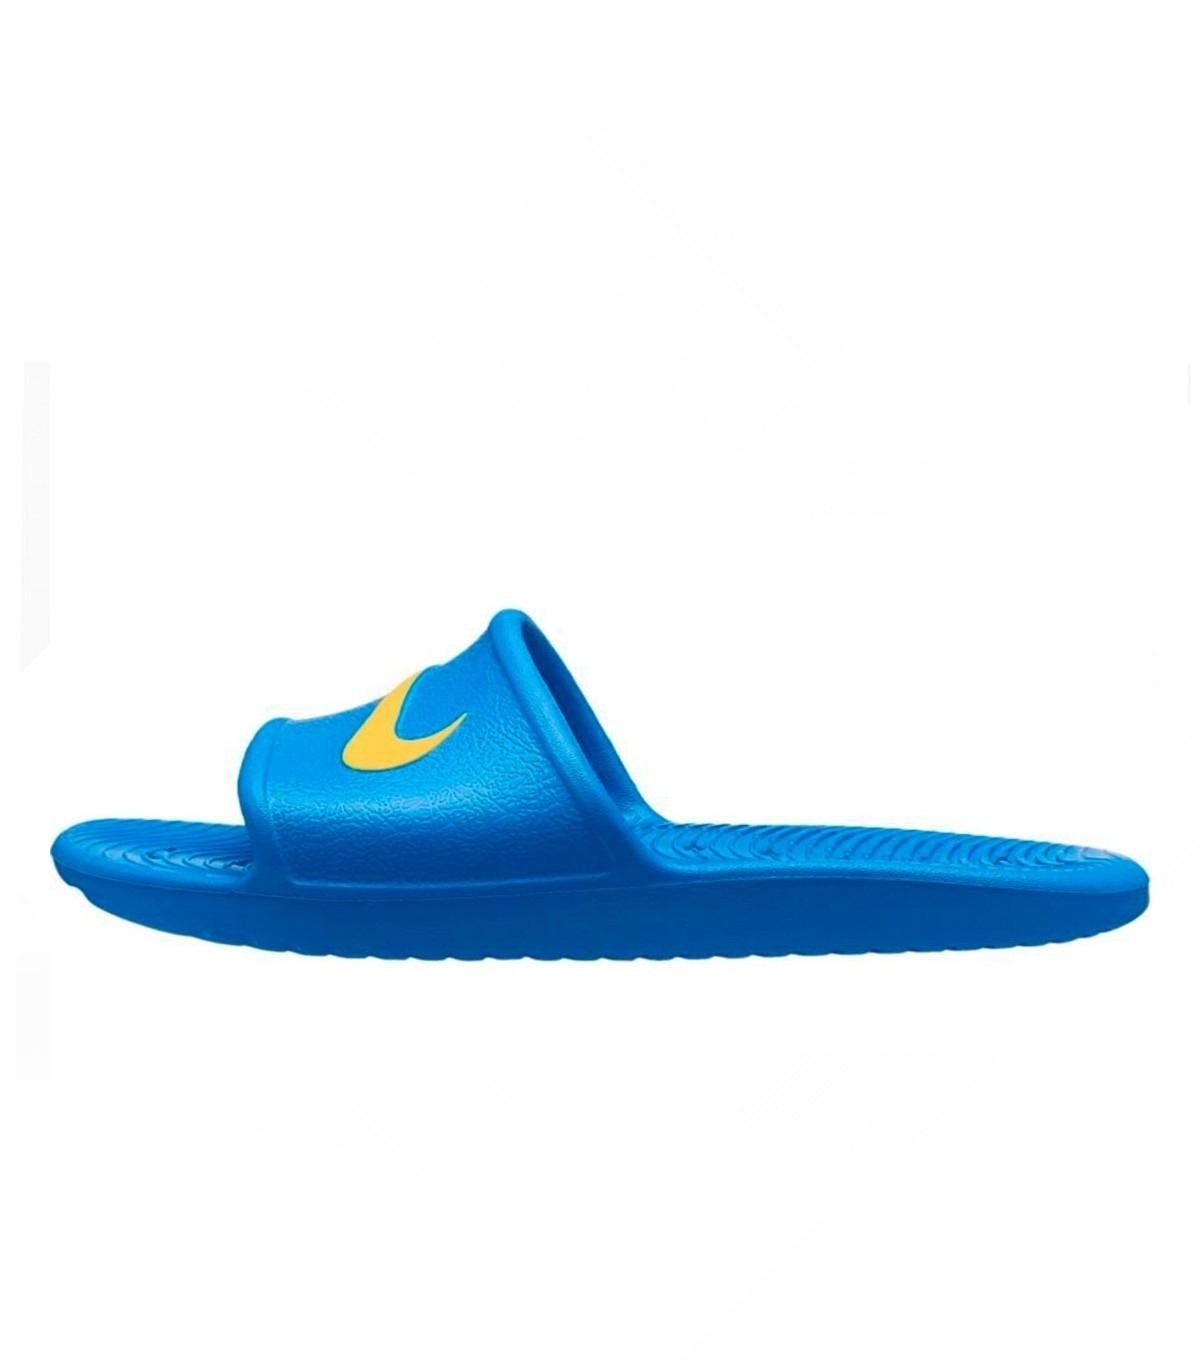 Comprar Chanclas Nike Kawa Shower Gs 197fb7a417c4e